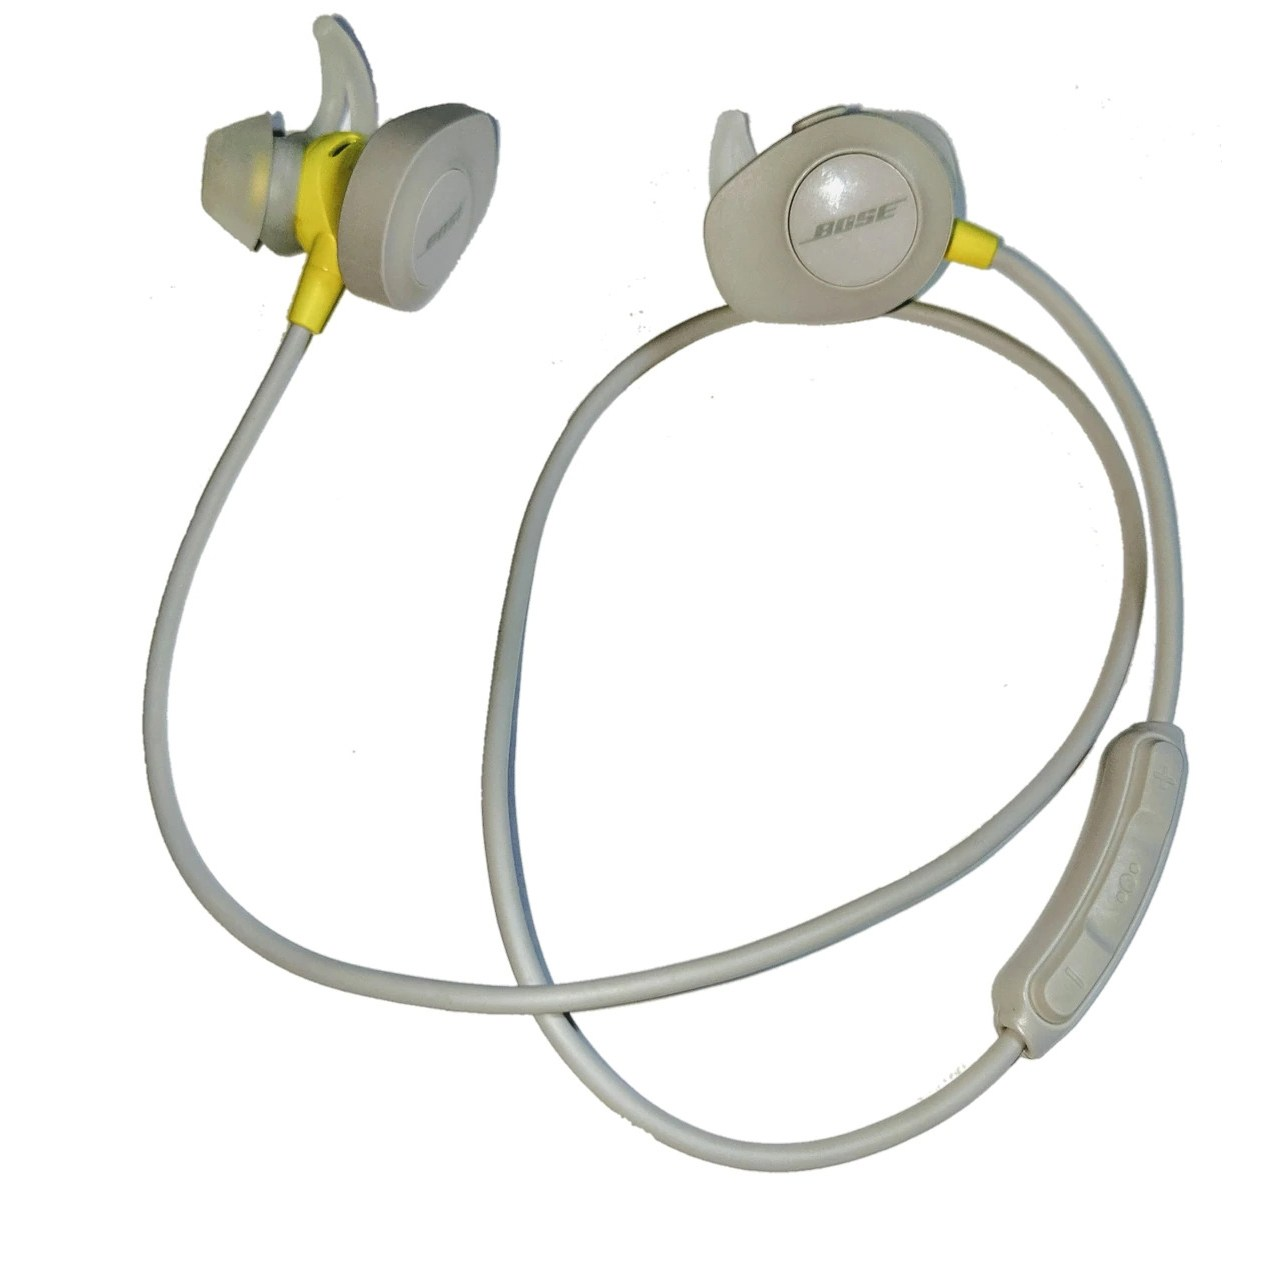 BOSE 사운드스포츠 와이어리스 블루투스이어폰, Citron, 761529-0030